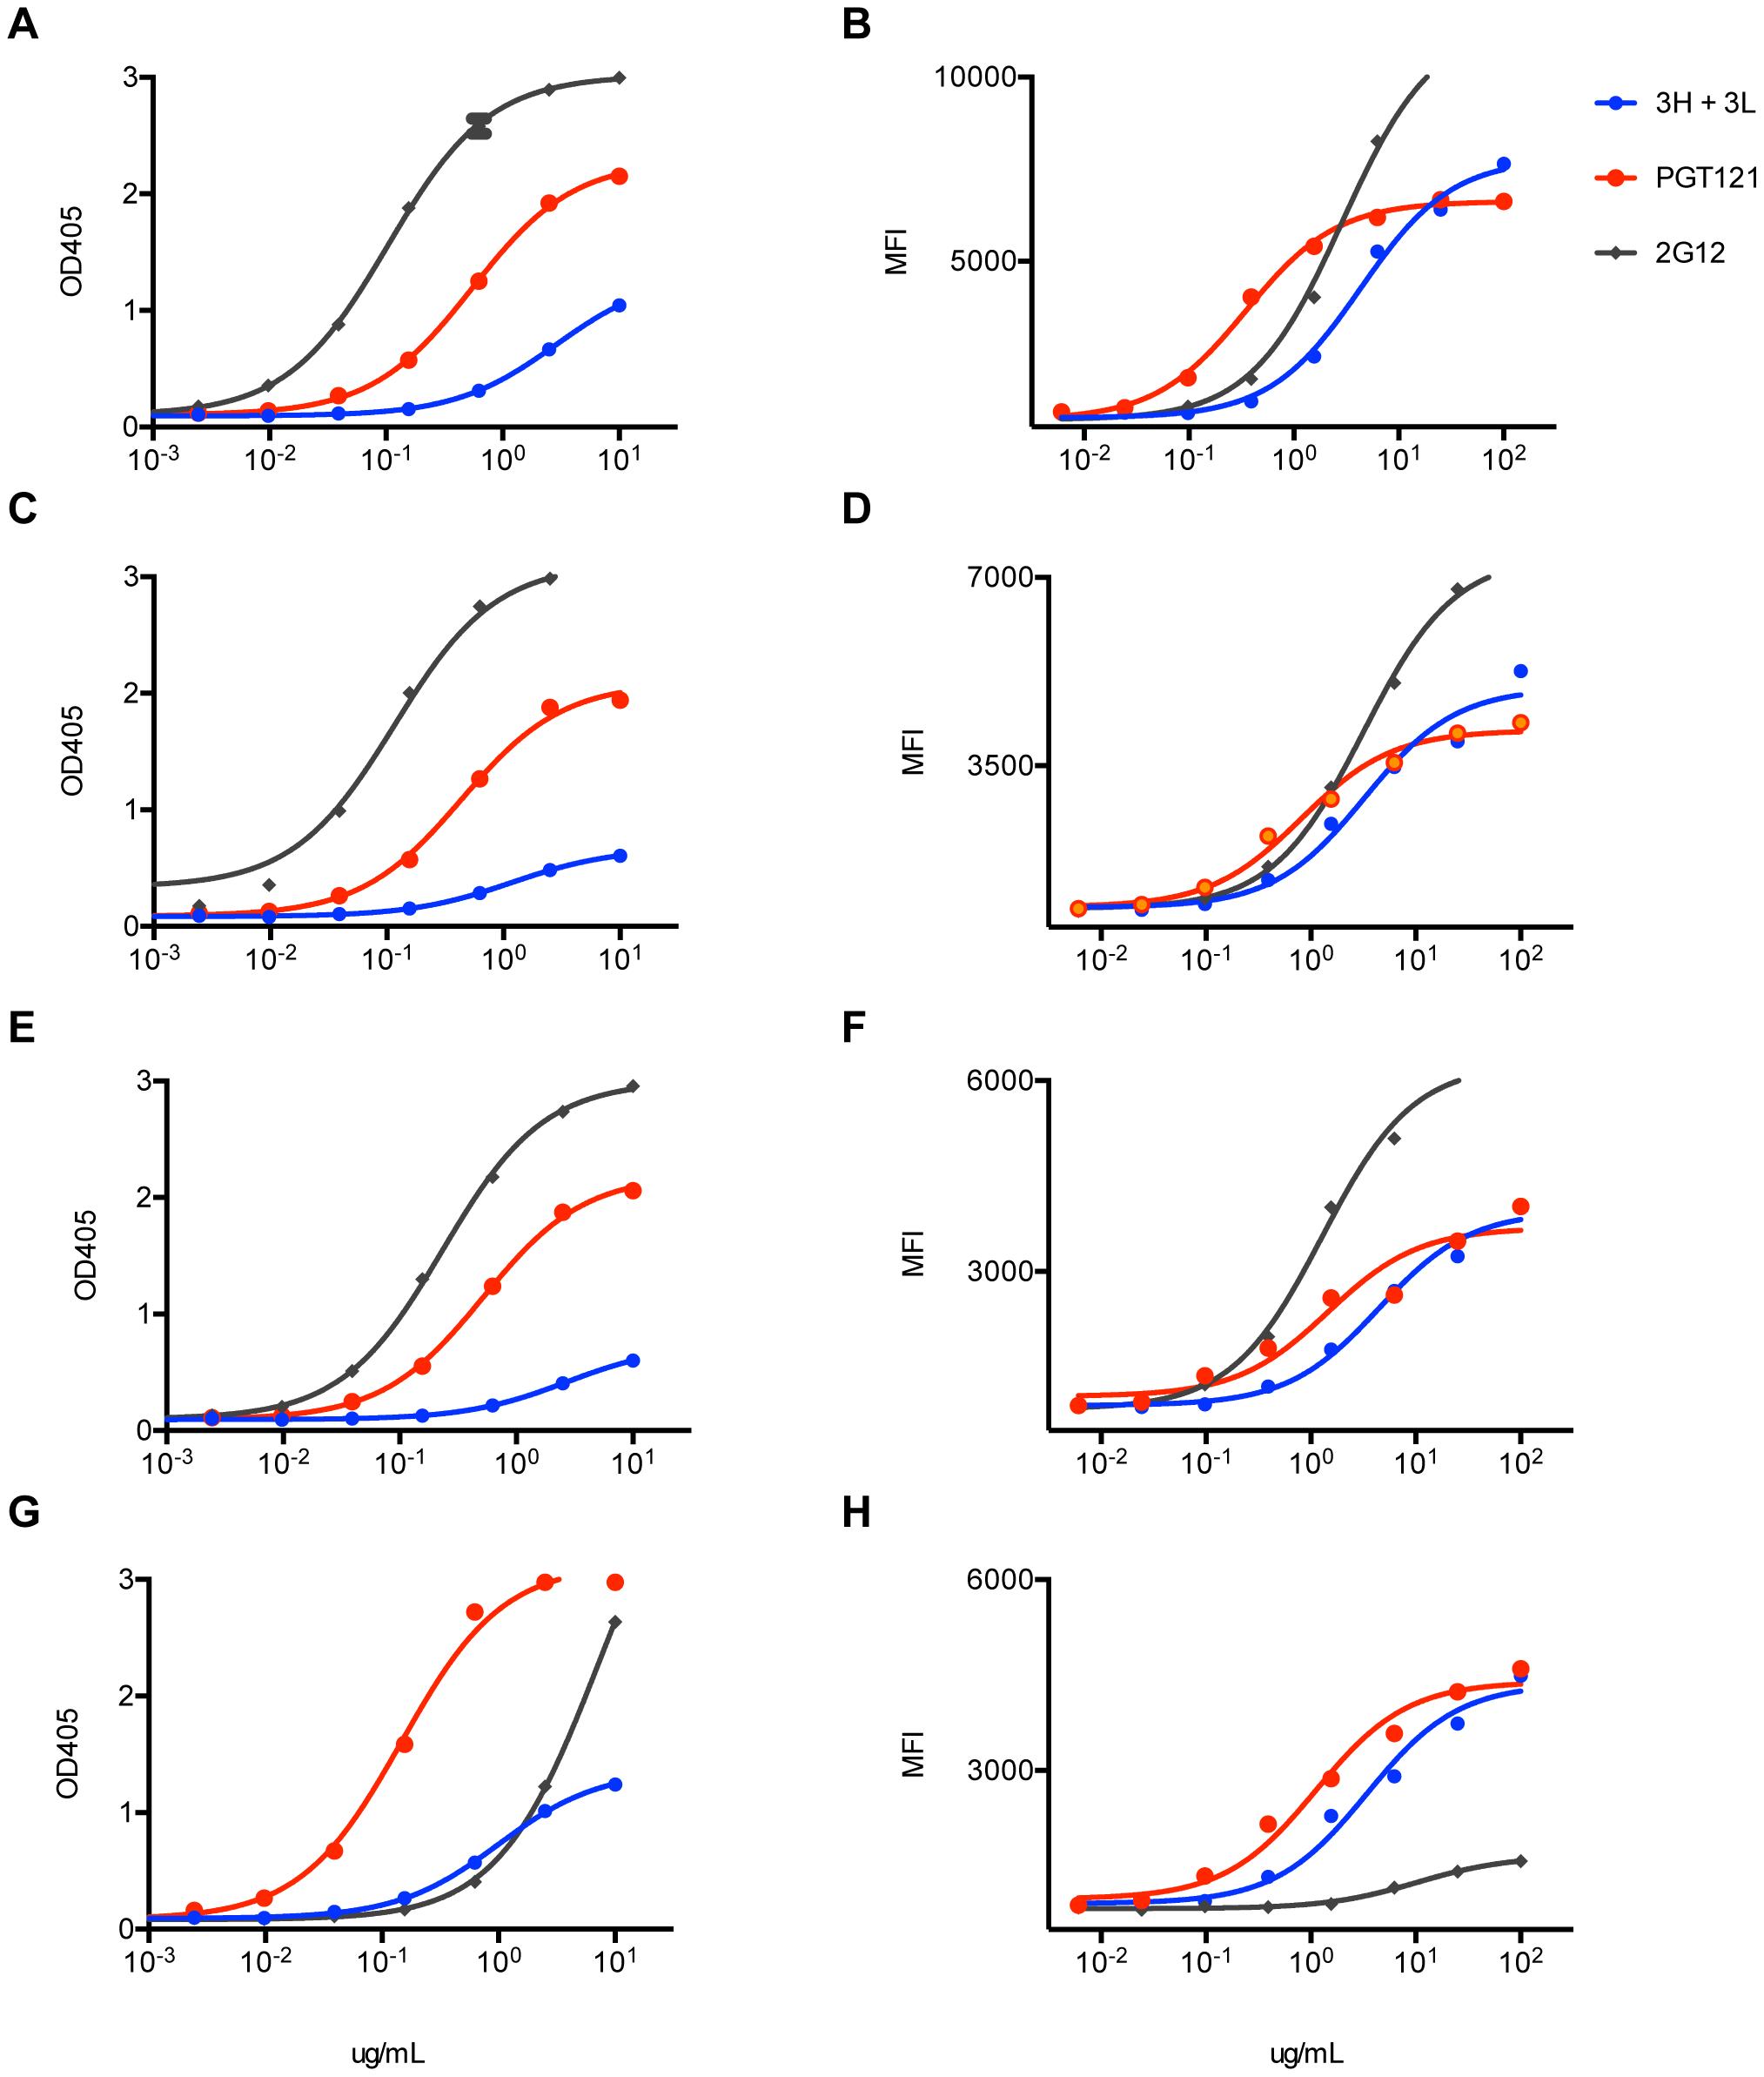 Inferred intermediate antibodies preferentially bind native Env relative to monomeric gp120.